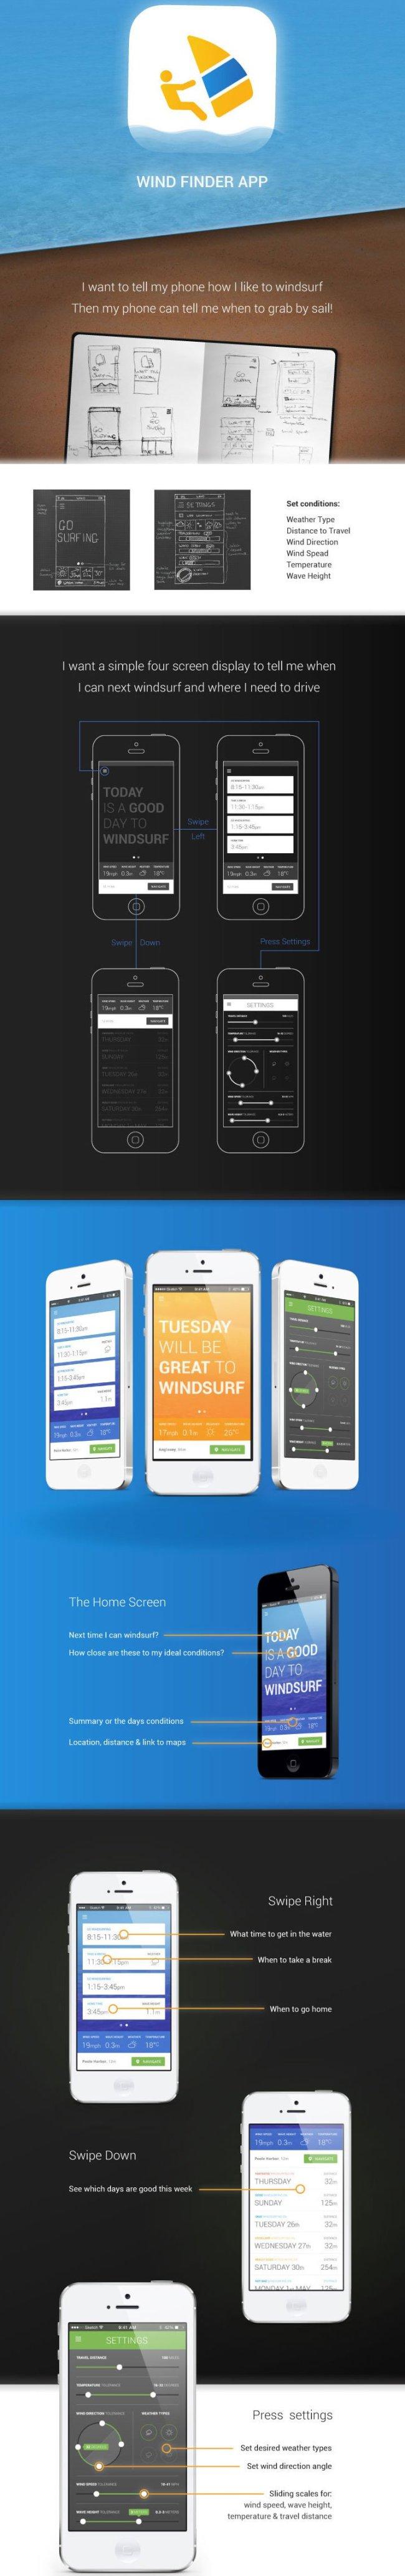 Windsurfing-App